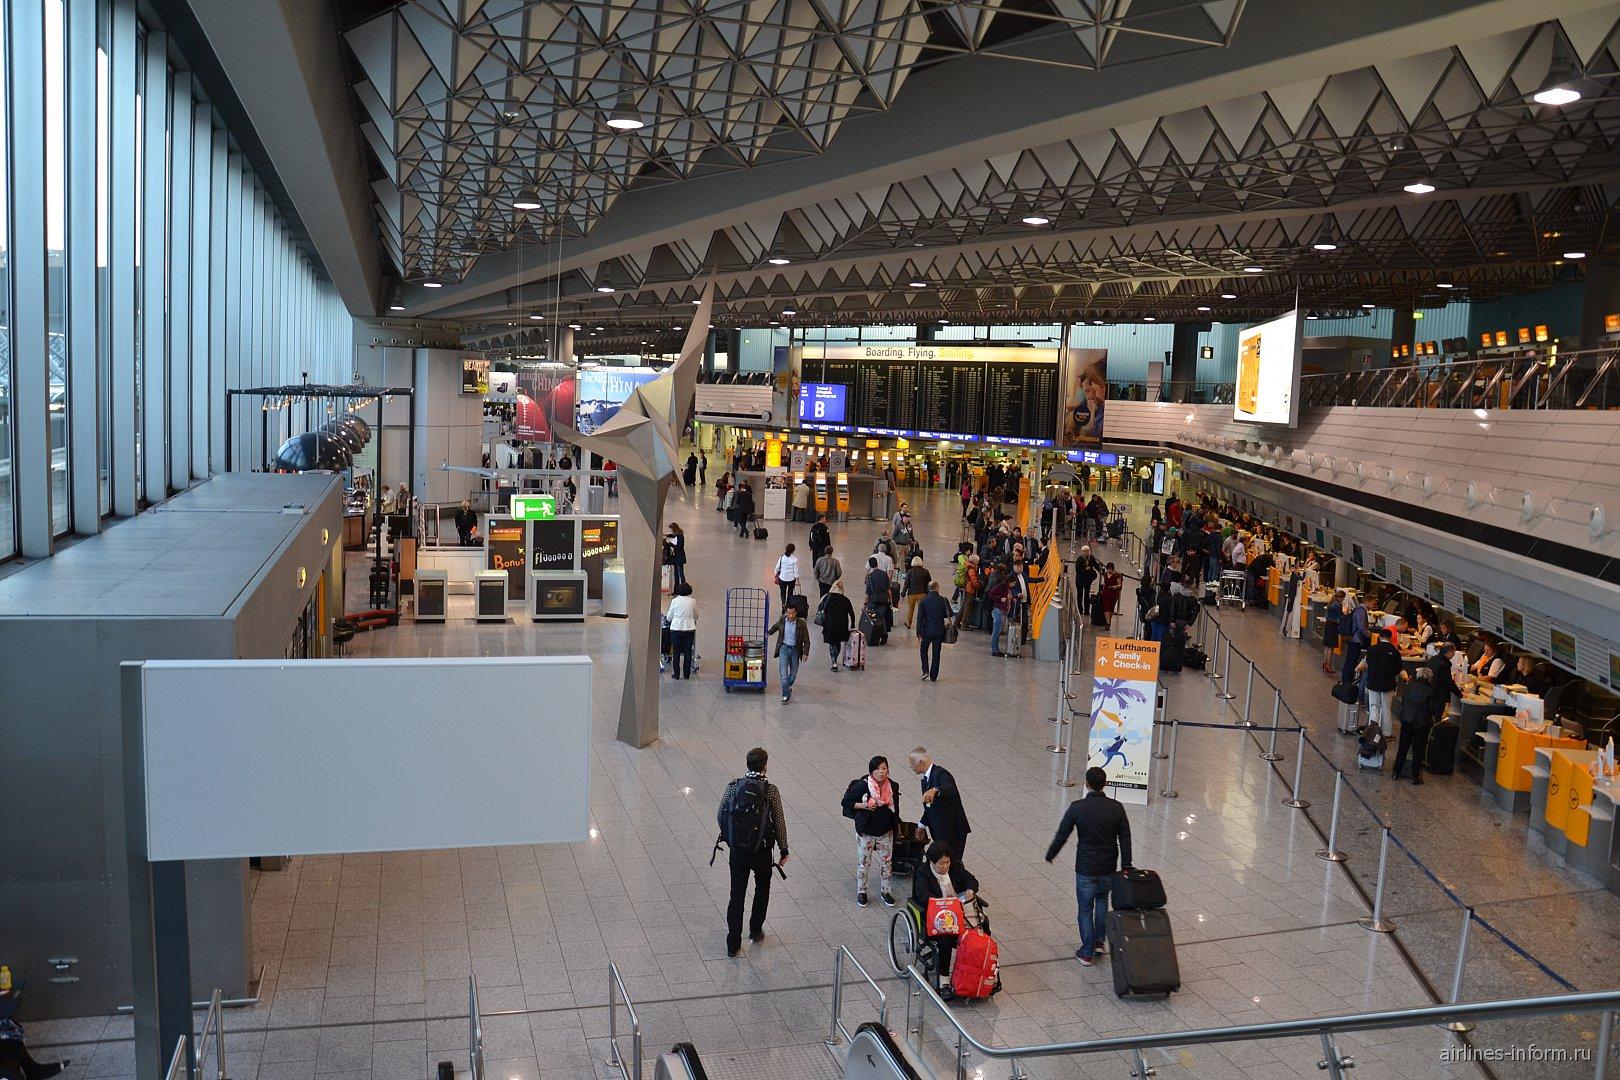 Общий вид пассажирского терминала 1 аэропорта Франкфурт-на-Майне